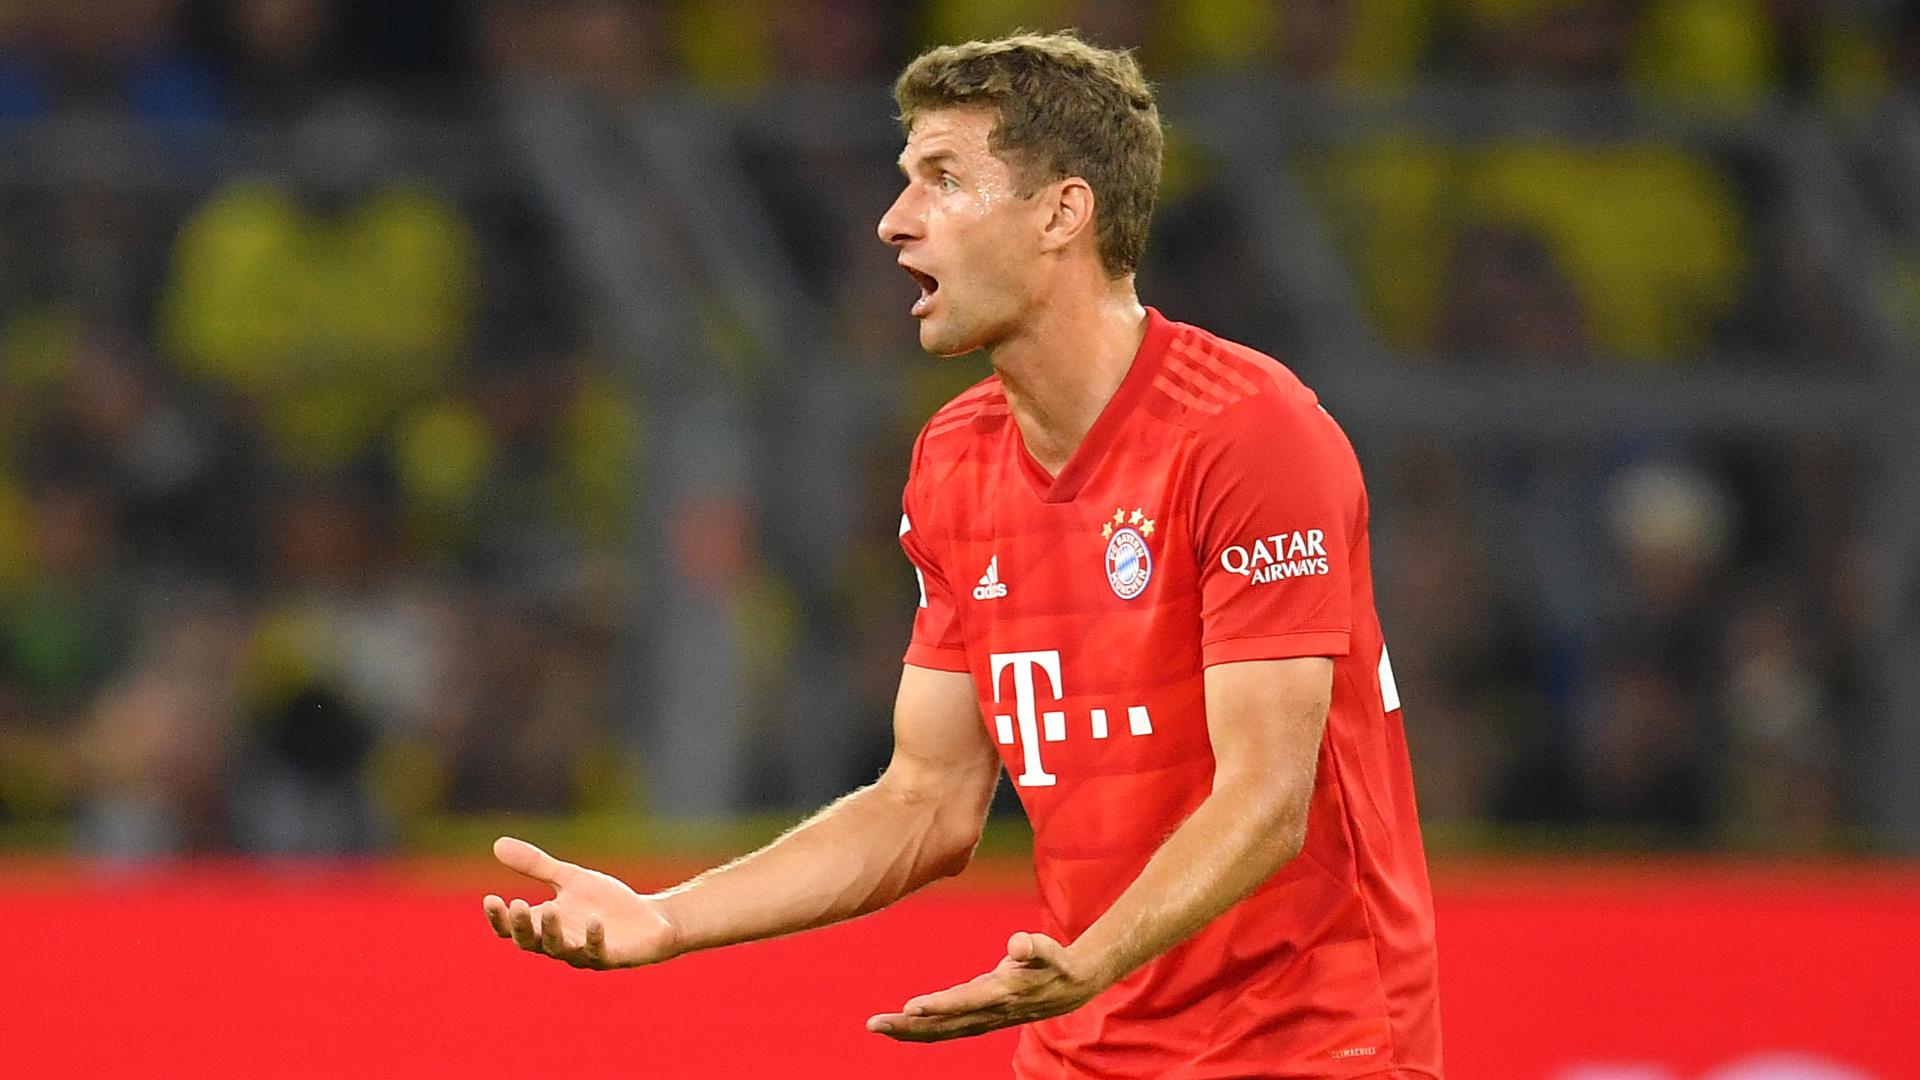 Thomas Müller Bayern BVB Supercup 2019